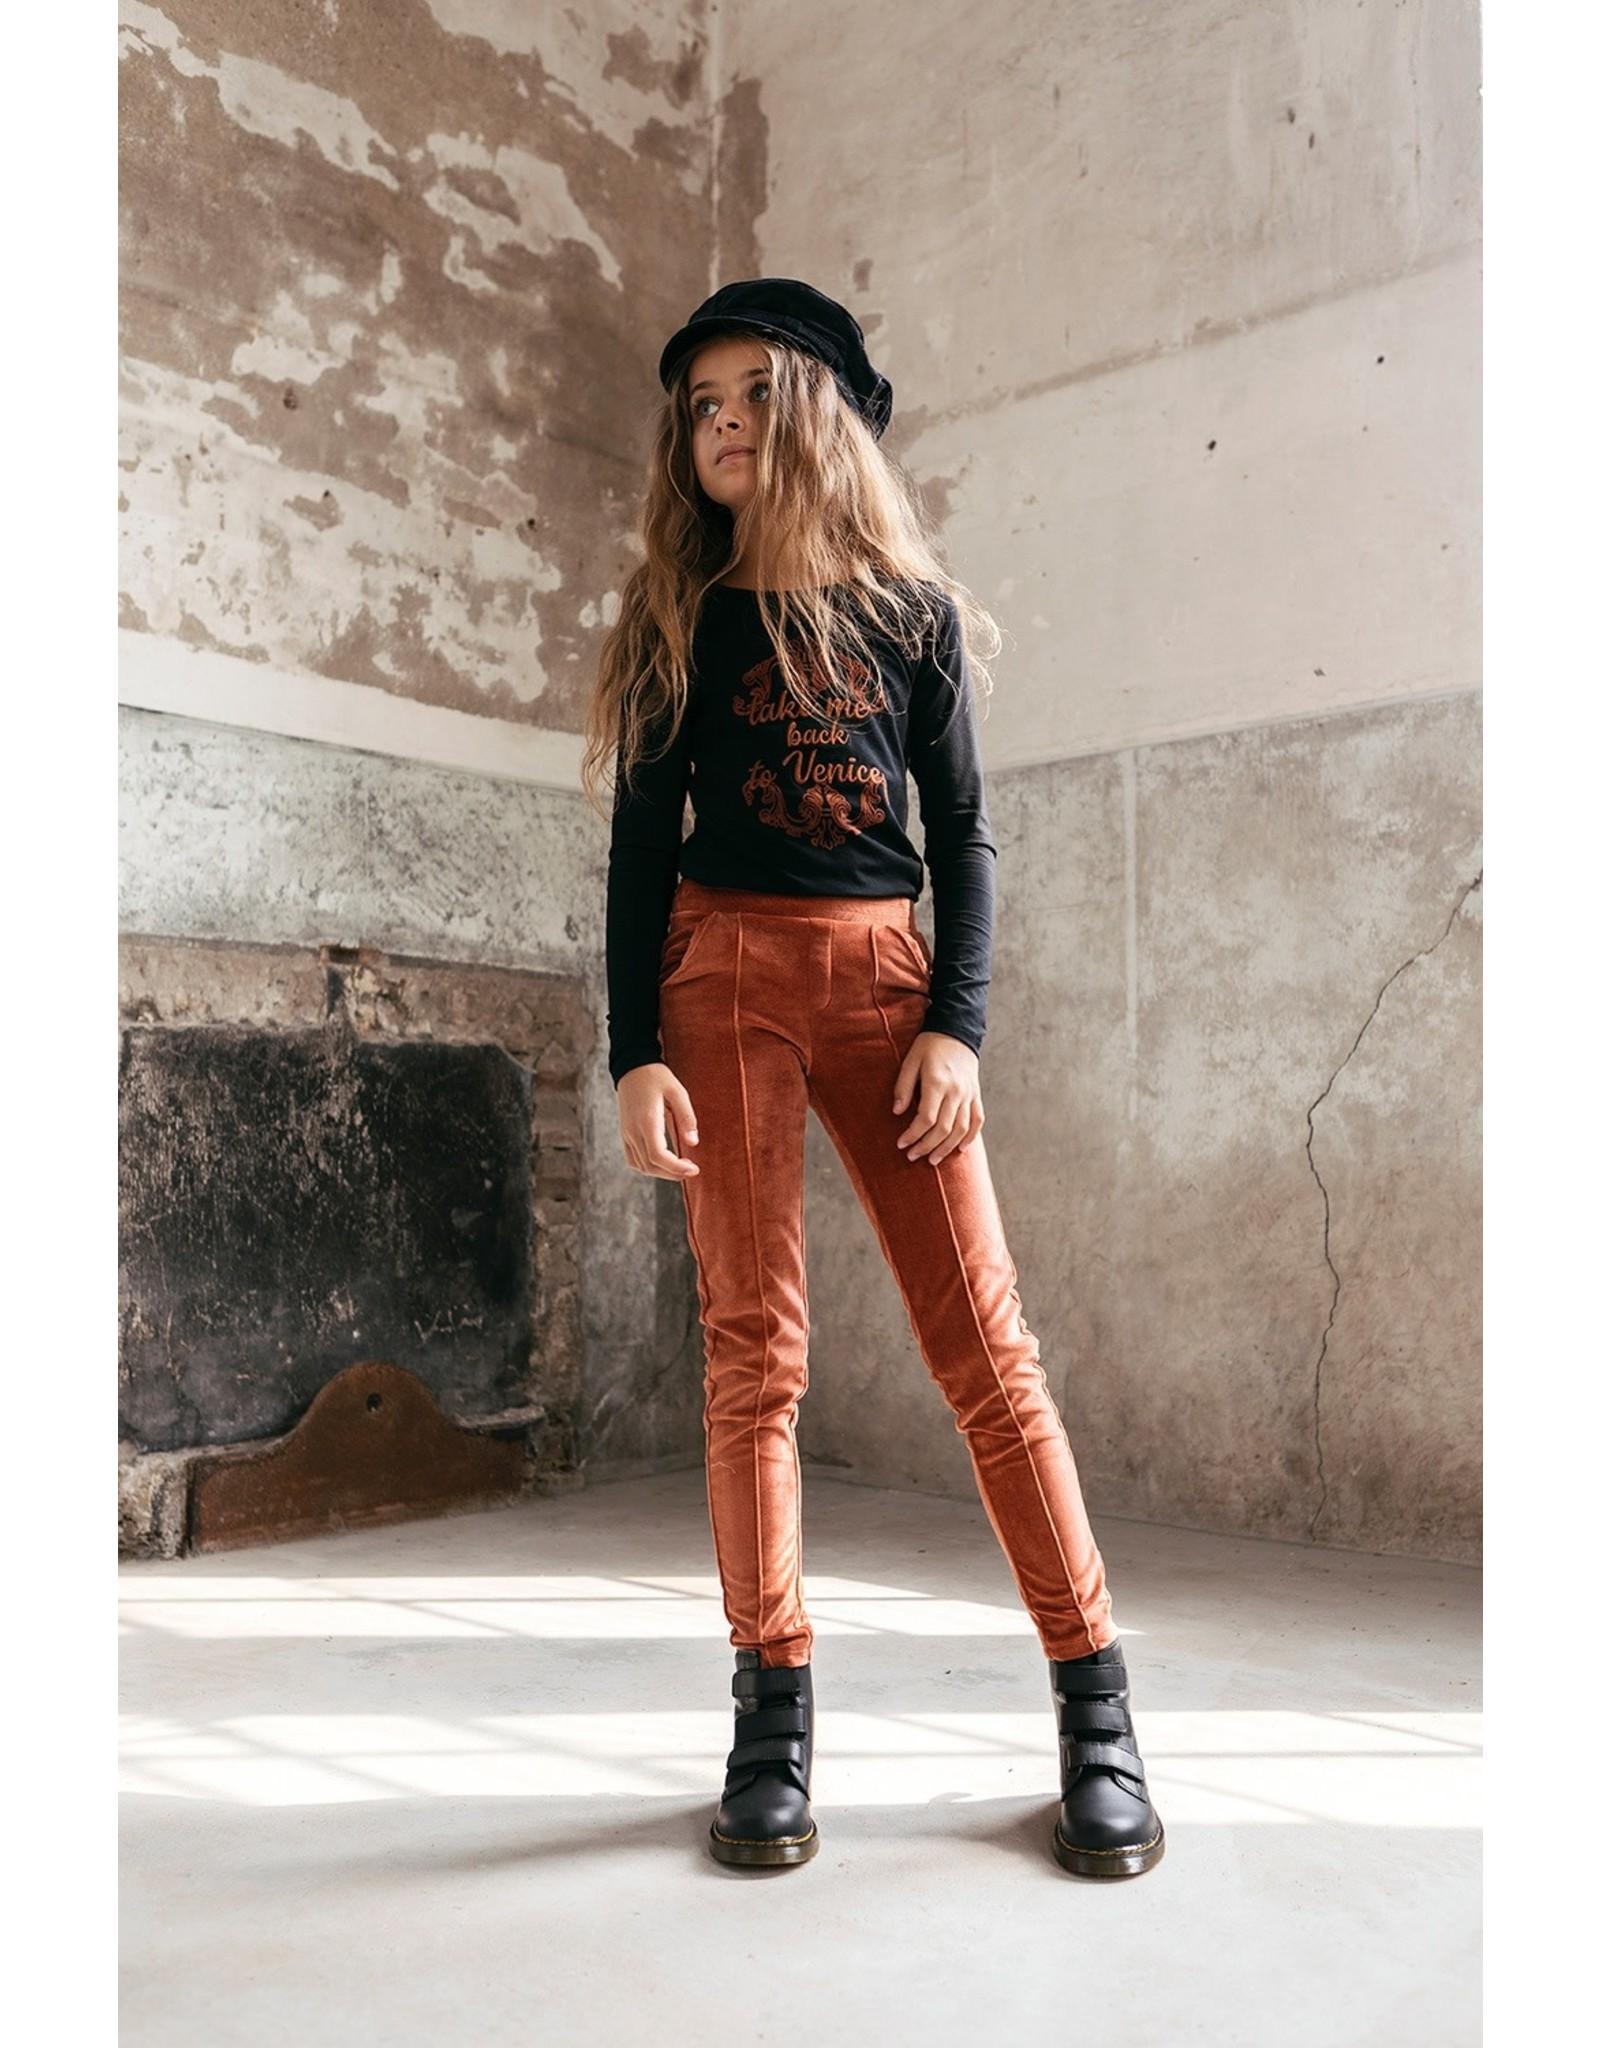 Looxs Girls sweat pants Autumn